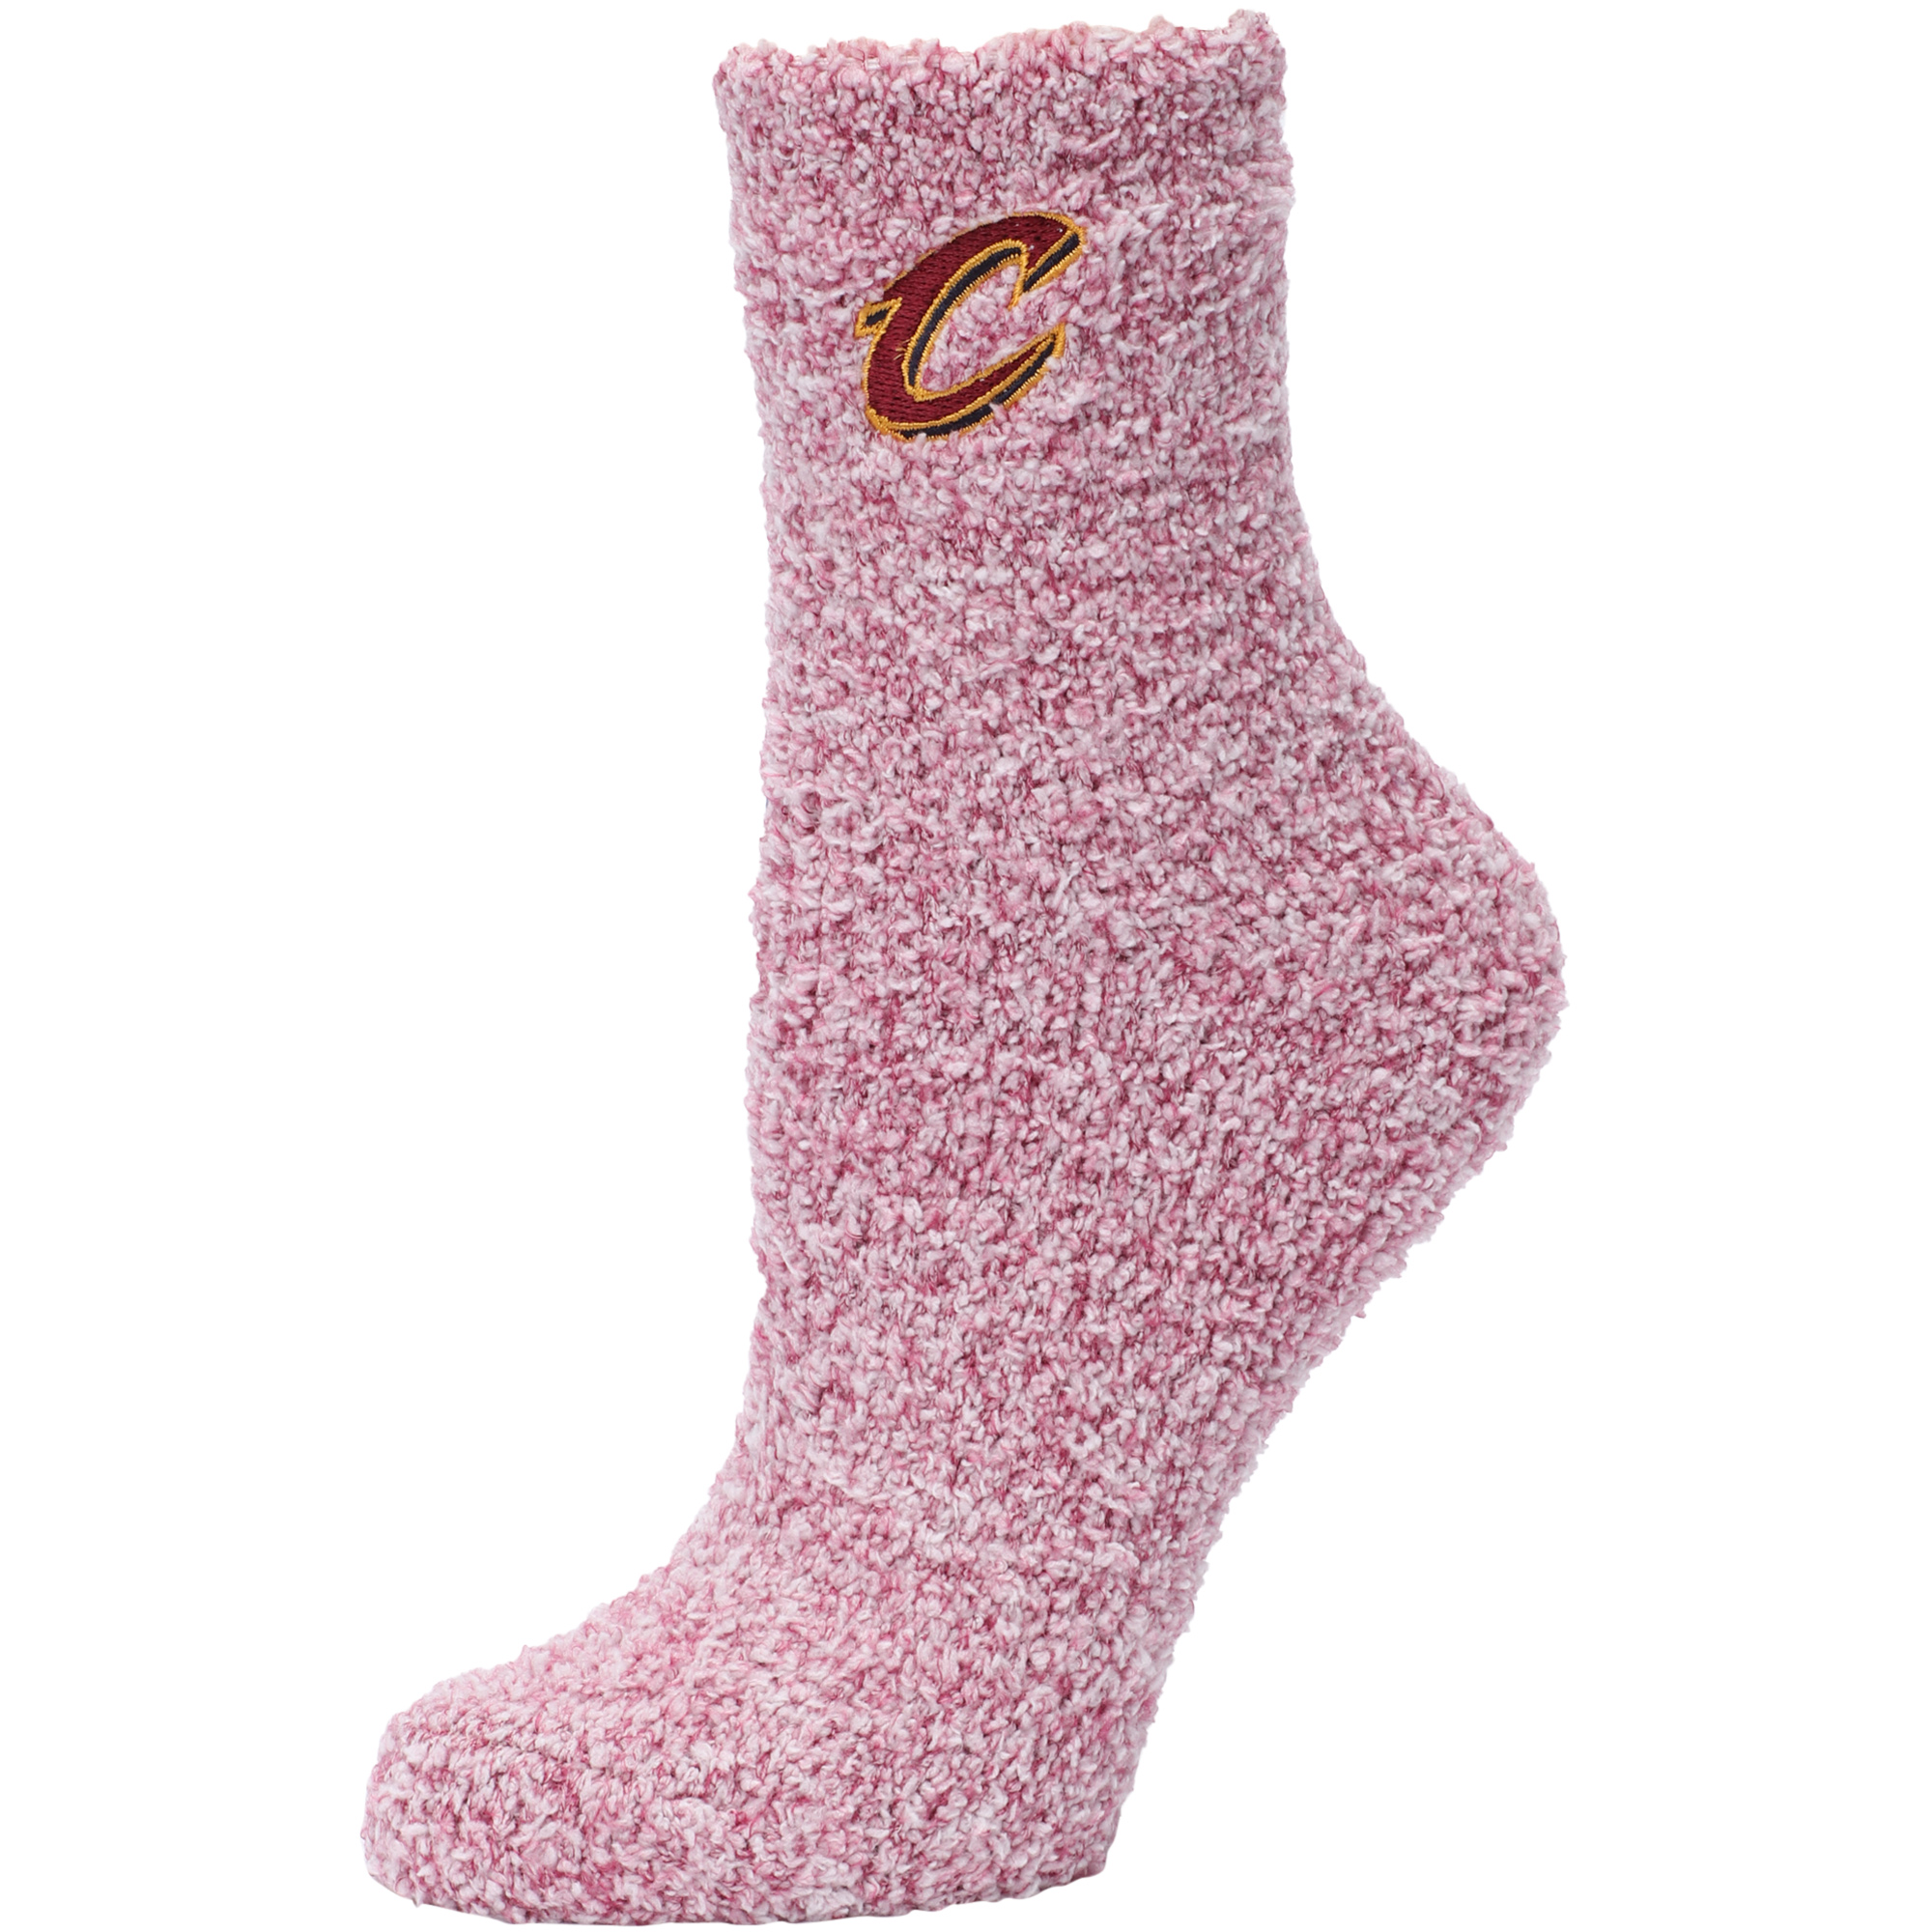 Cleveland Cavaliers Women's Fuzzy Block Tri-Blend Socks - Wine - M